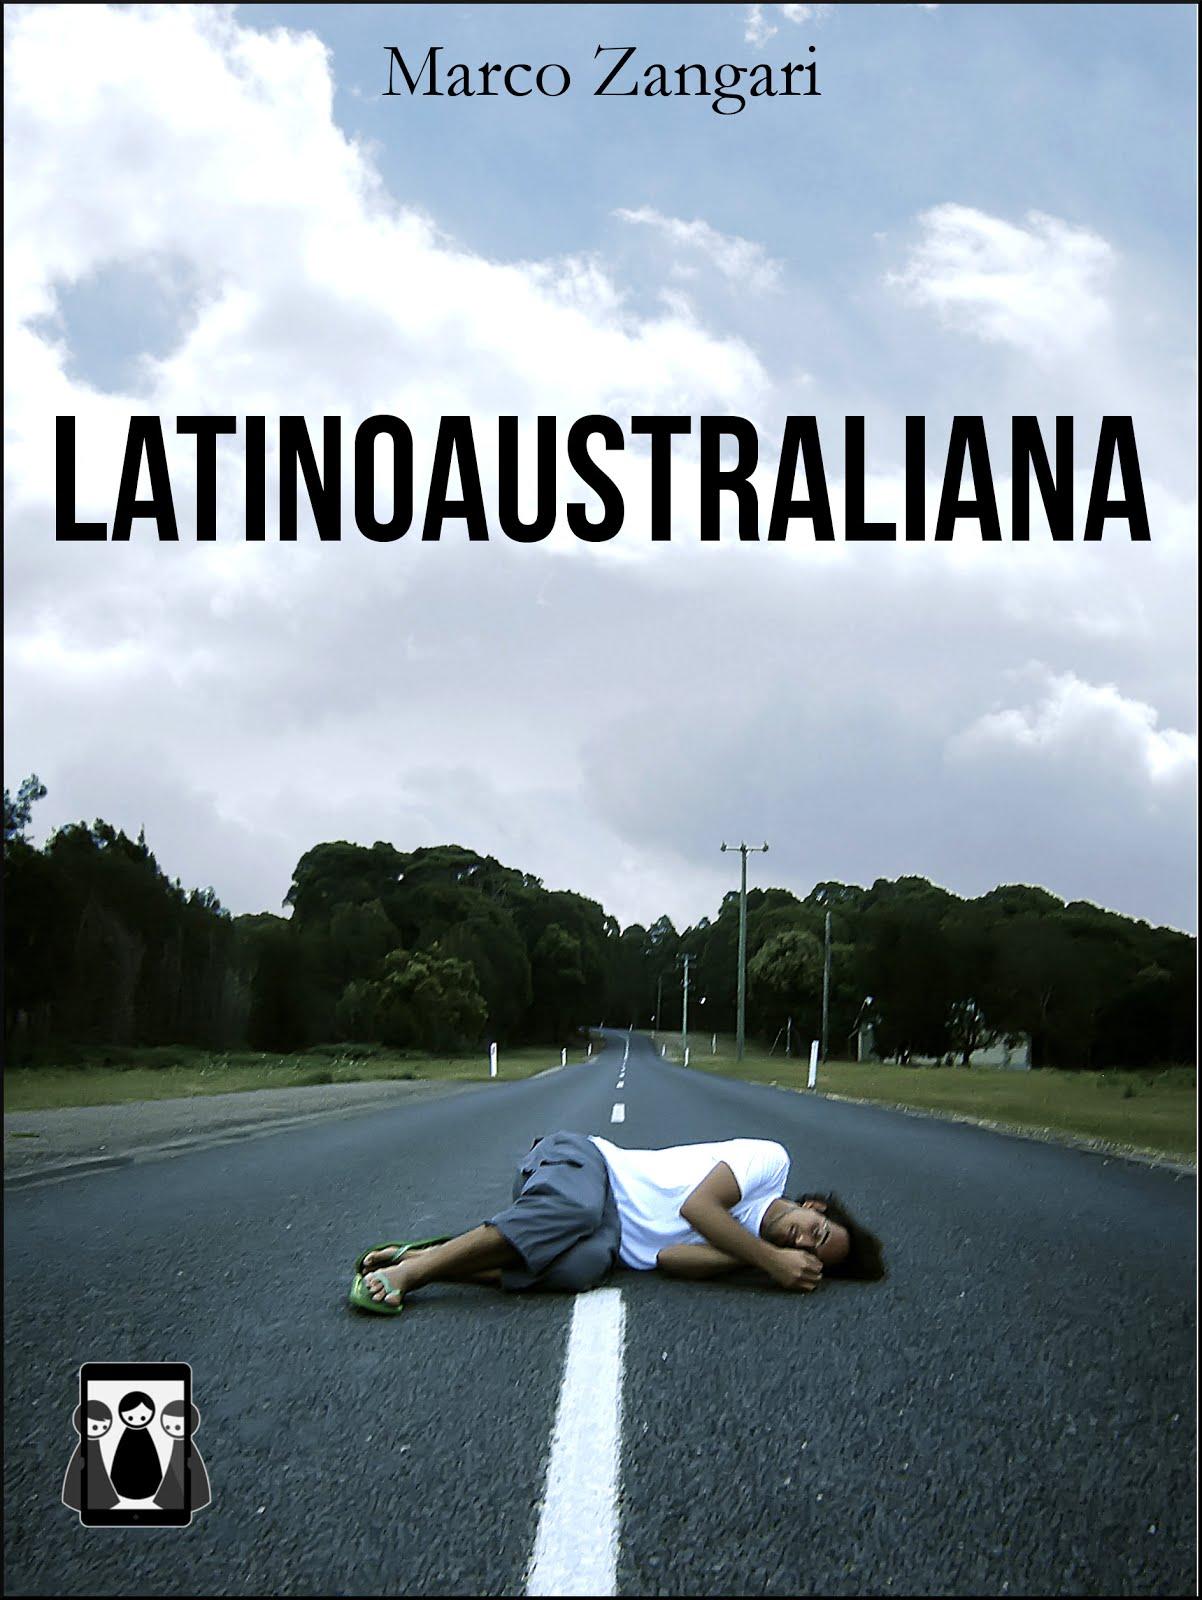 Latinoaustraliana!